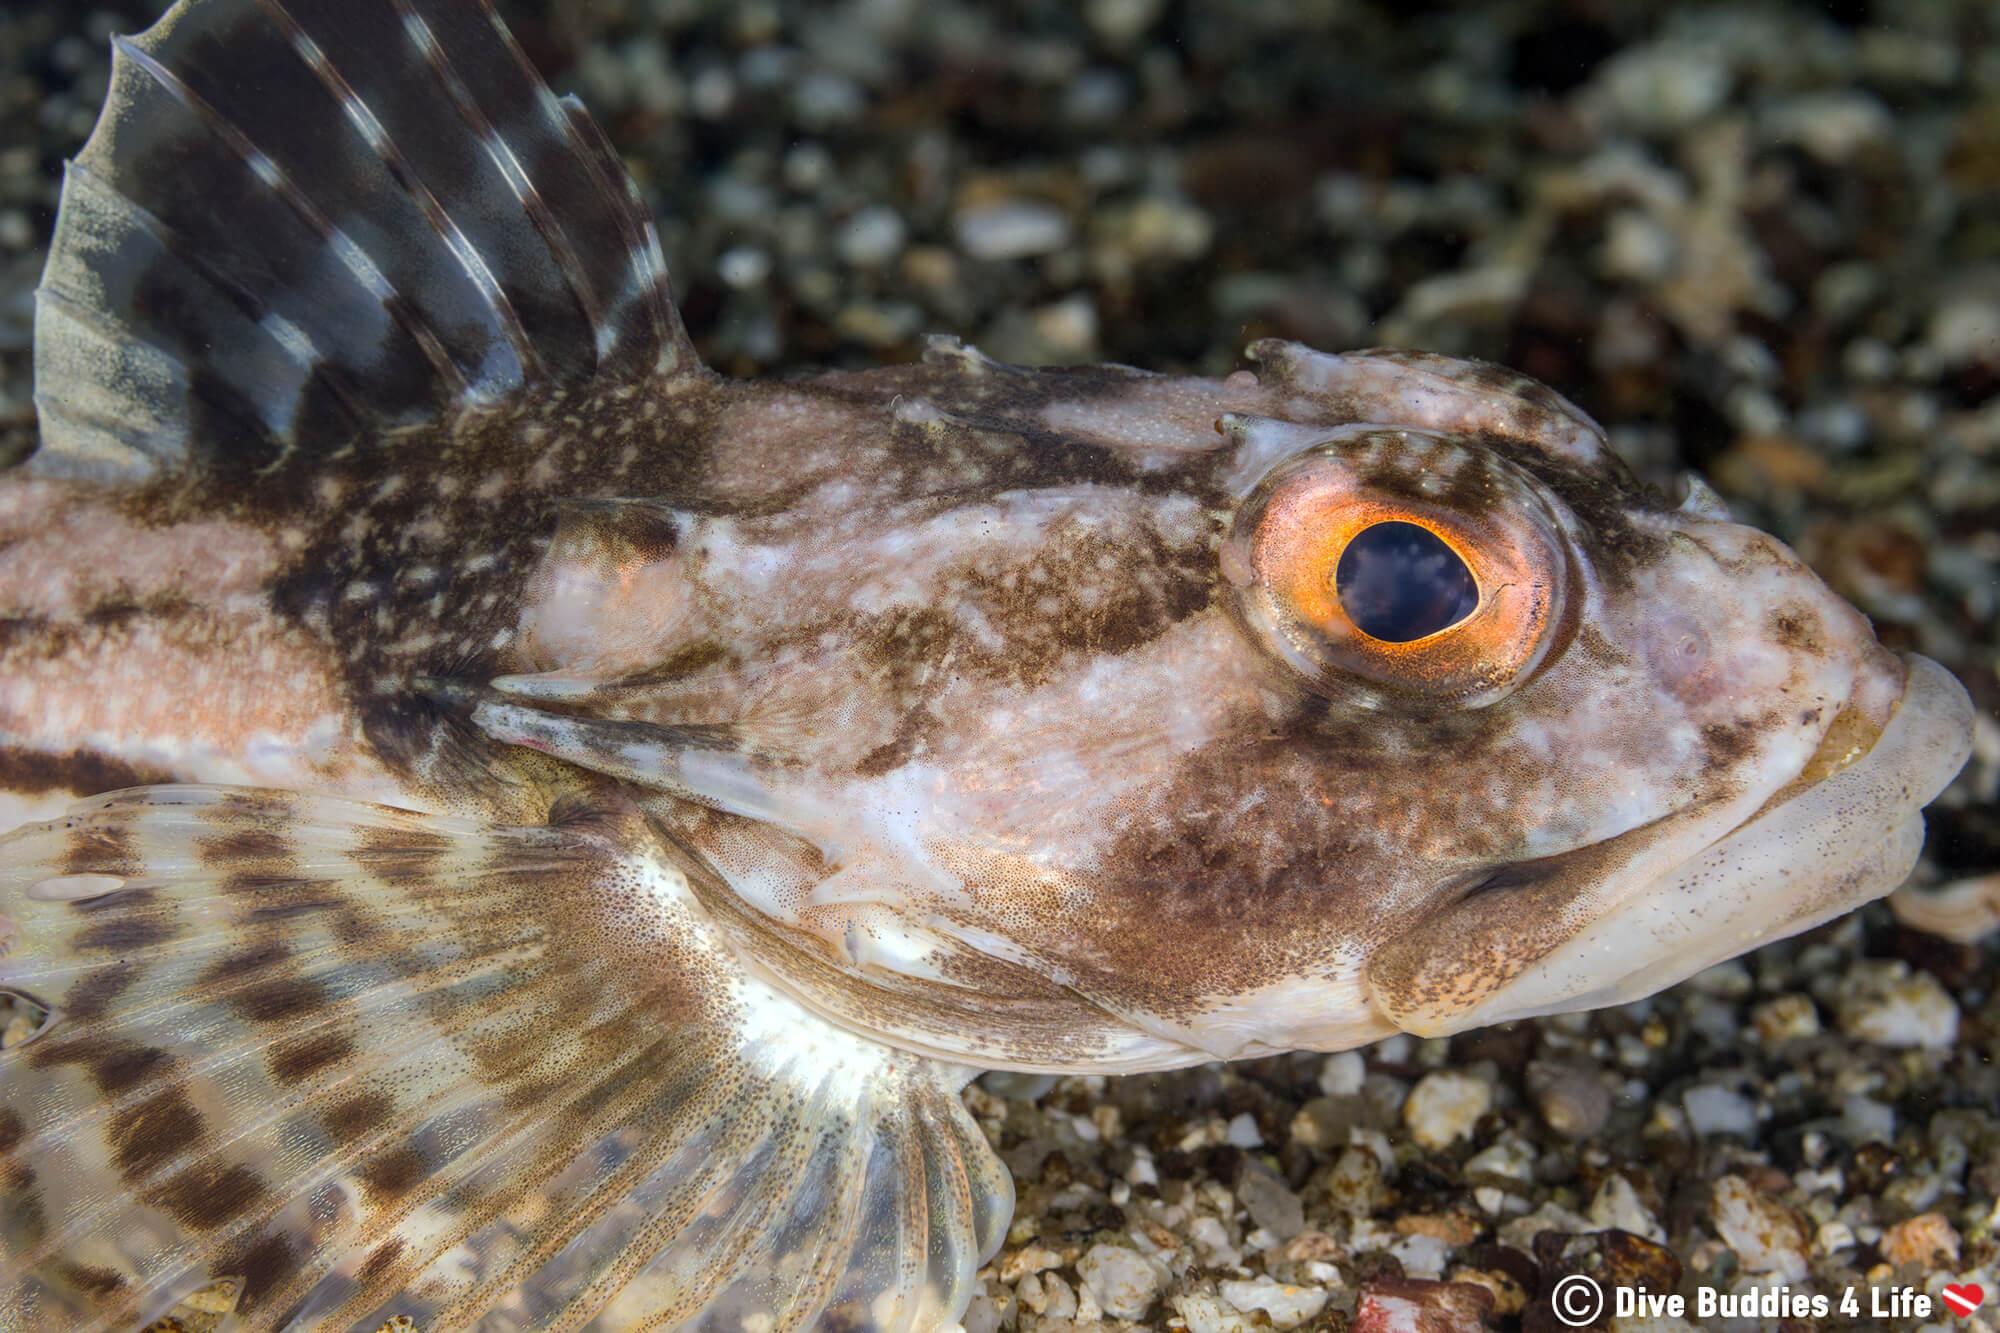 A Sculpin Profile Photo Taken While Scuba Diving At The Paddies Head Dive Site In Halifax, Nova Scotia, Canada